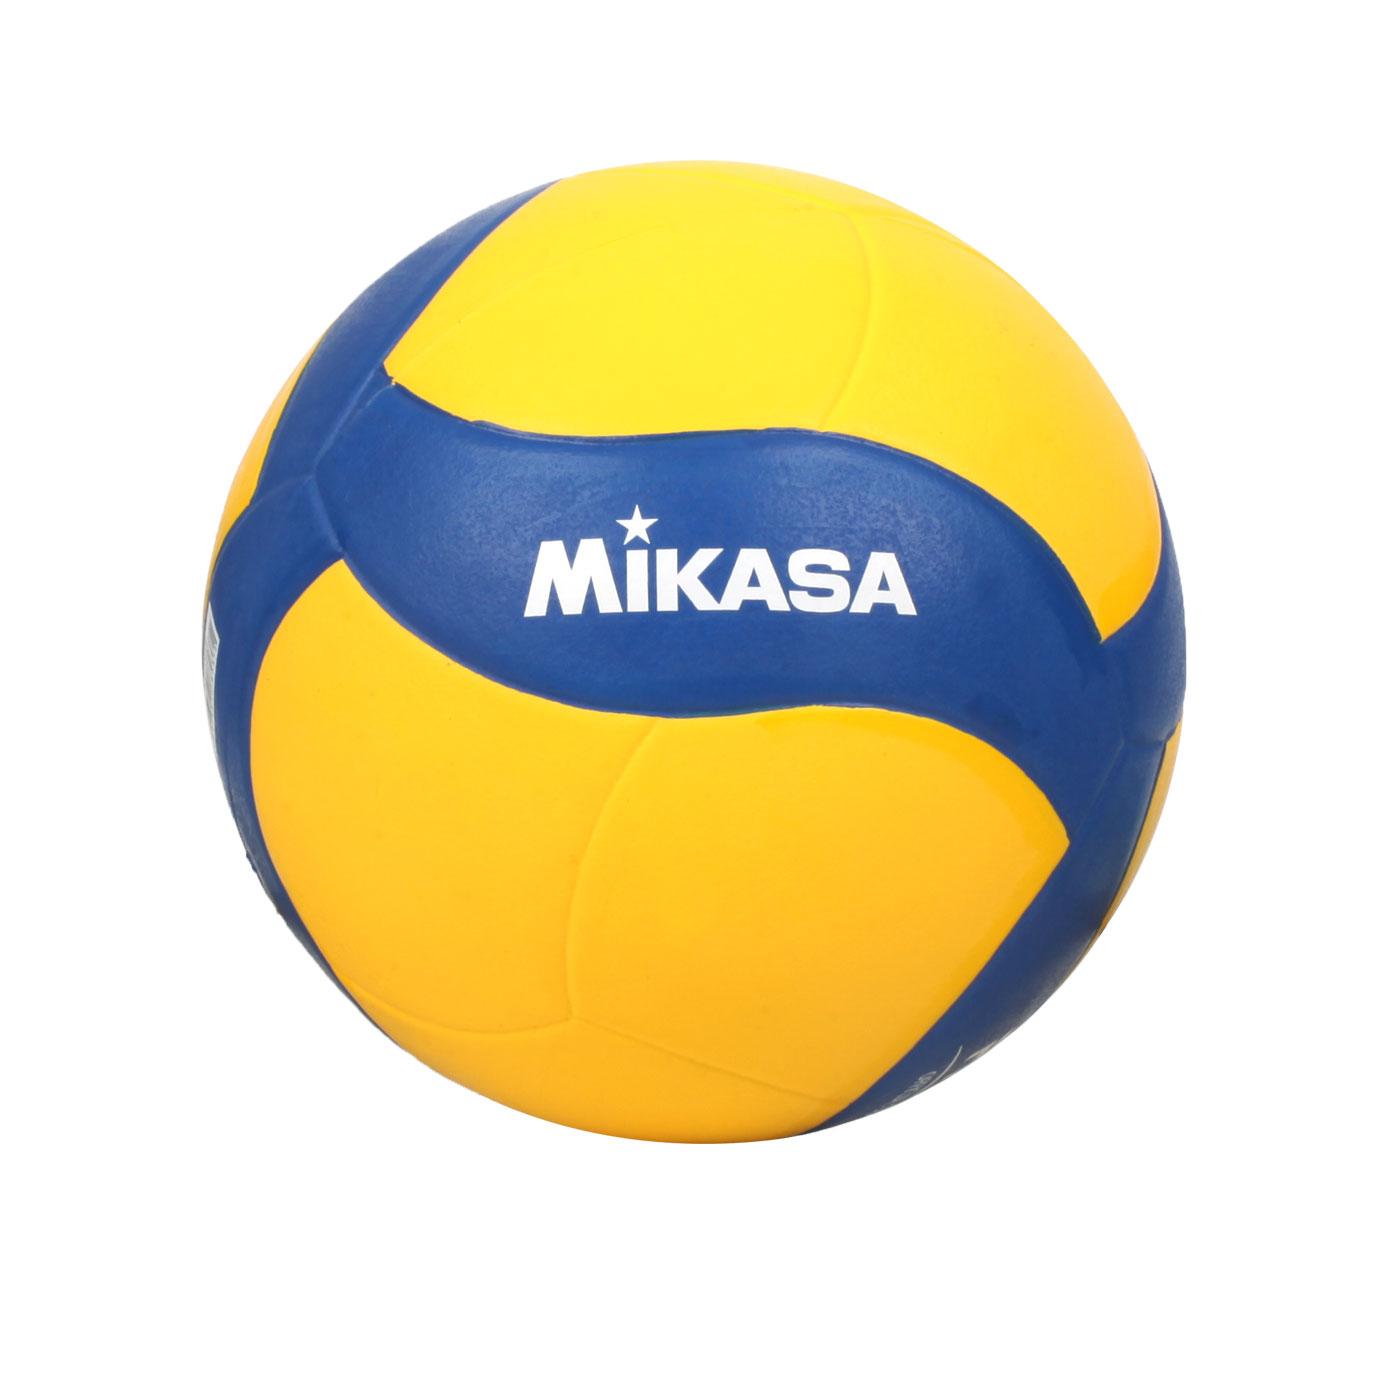 MIKASA 螺旋形軟橡膠排球 #5 MKV020WS - 黃藍